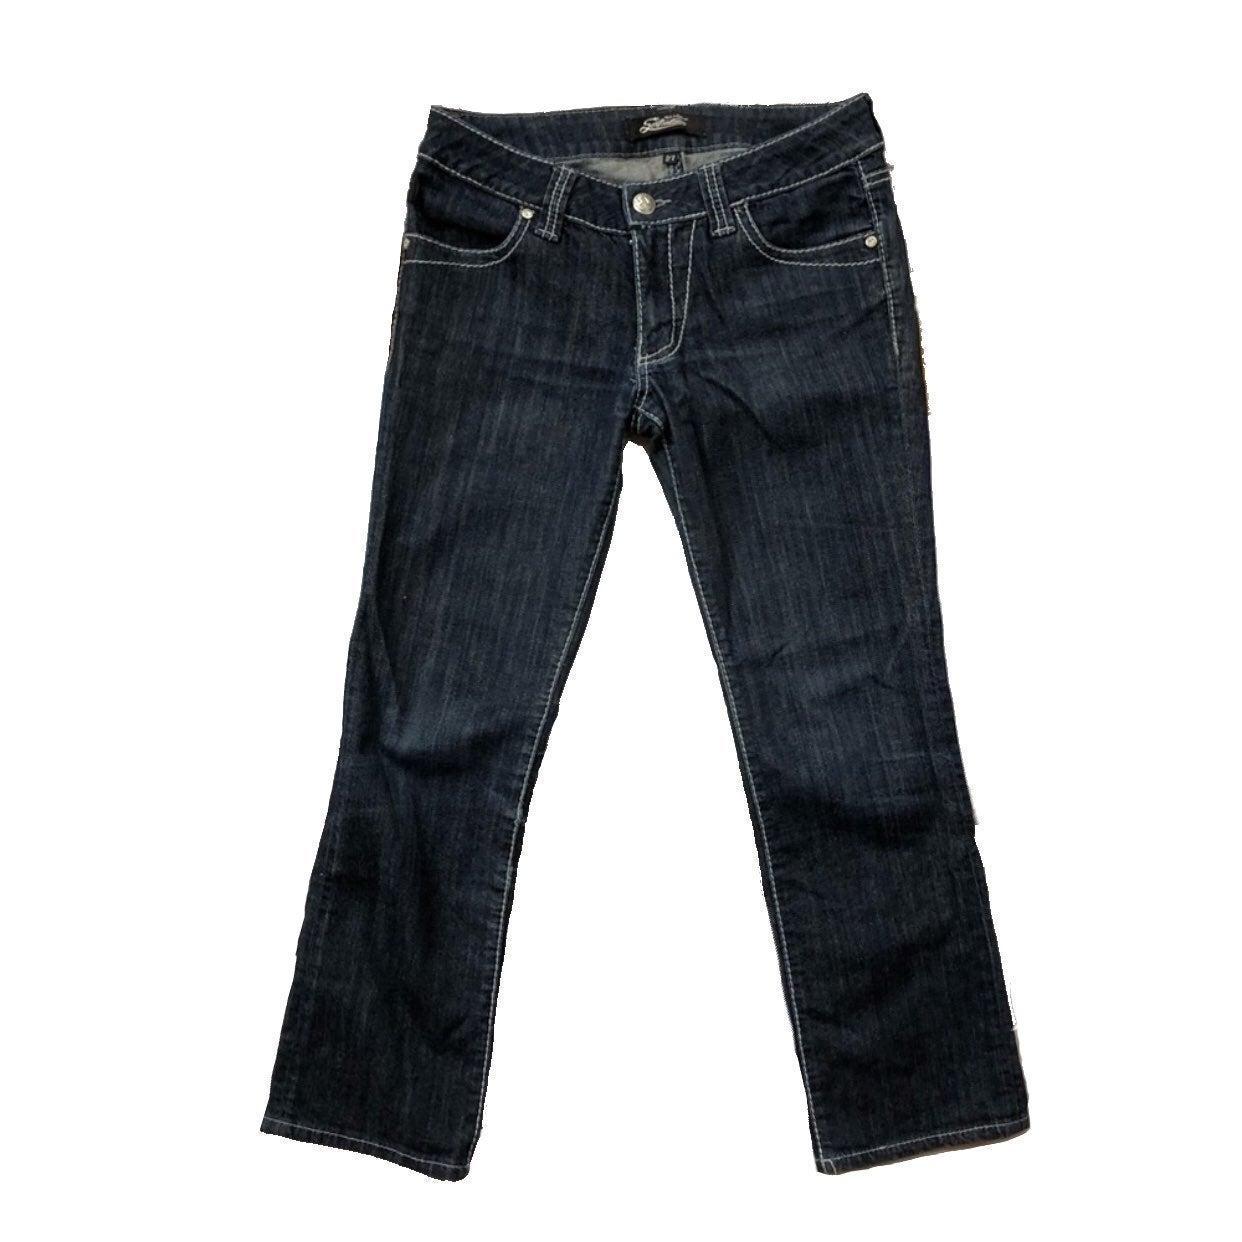 Serfontaine Dark Straight Ankle Jeans